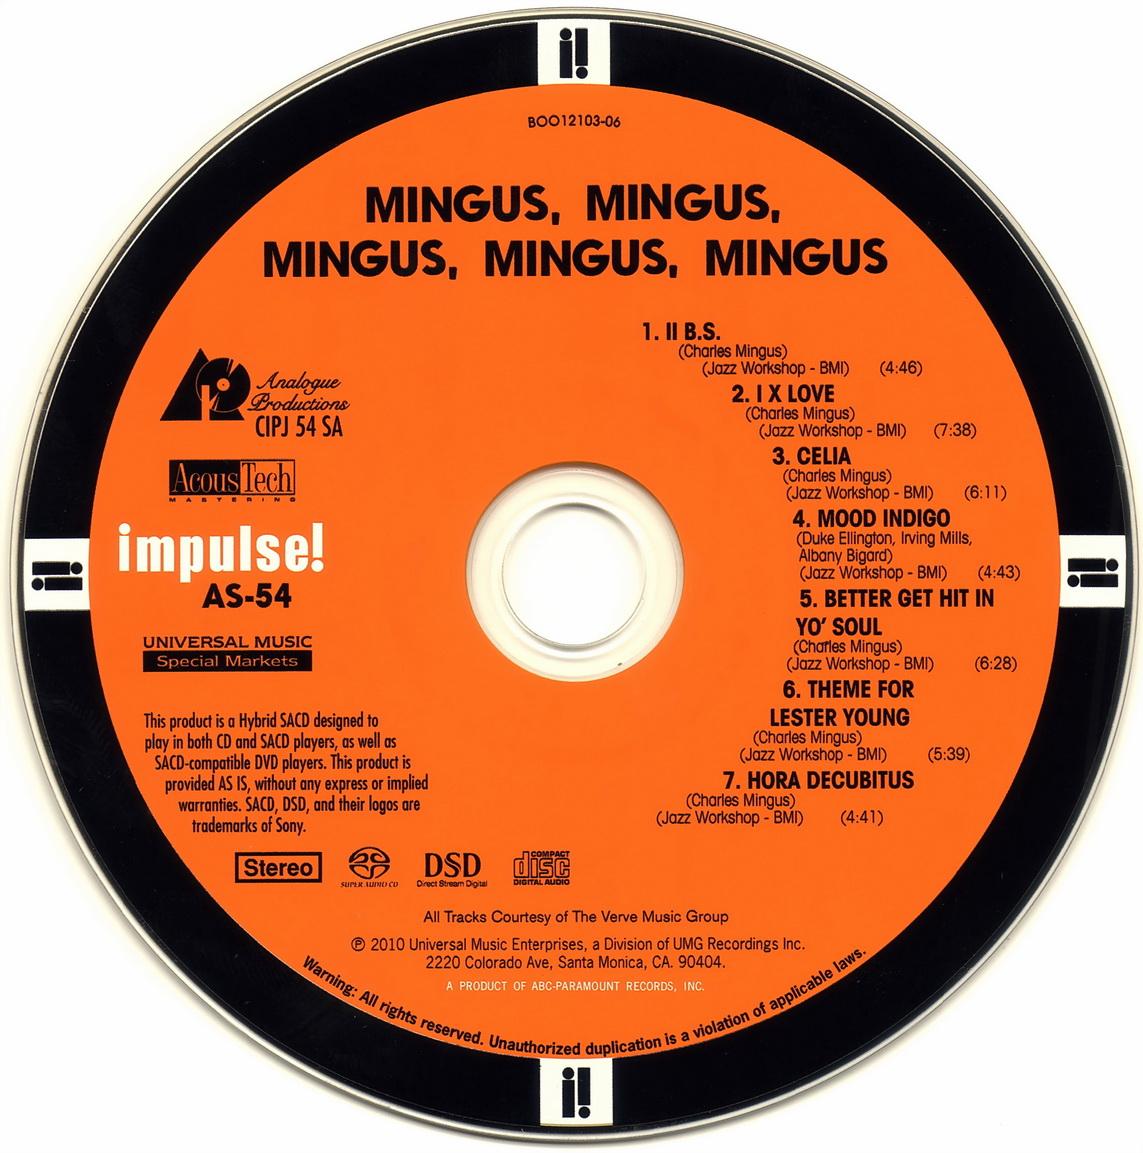 Charles Mingus - Mingus, Mingus, Mingus, Mingus, Mingus (1963) [Analogue Productions SACD Remastered 2010]